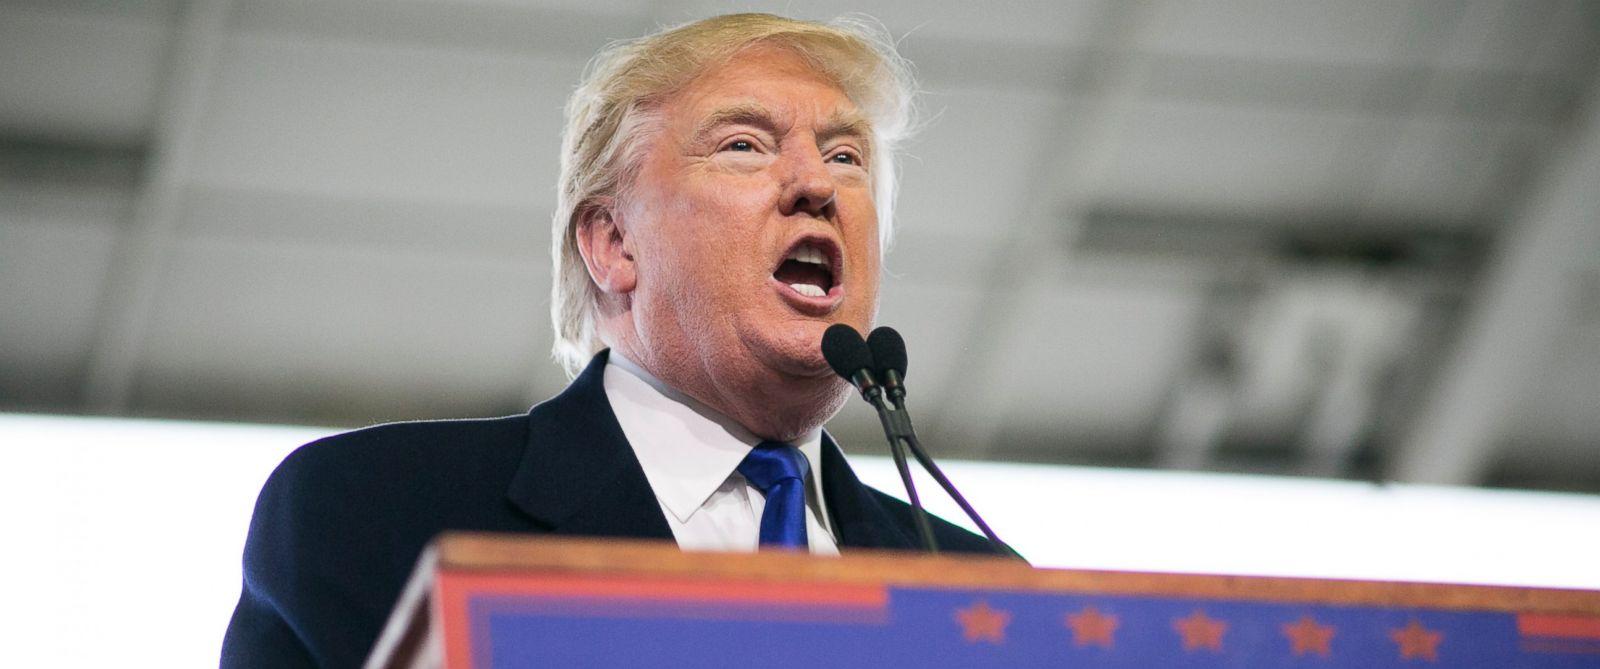 PHOTO:Donald Trump speaks at a rally held at Signature Flight Hangar in Columbus, Ohio, March 1, 2016.